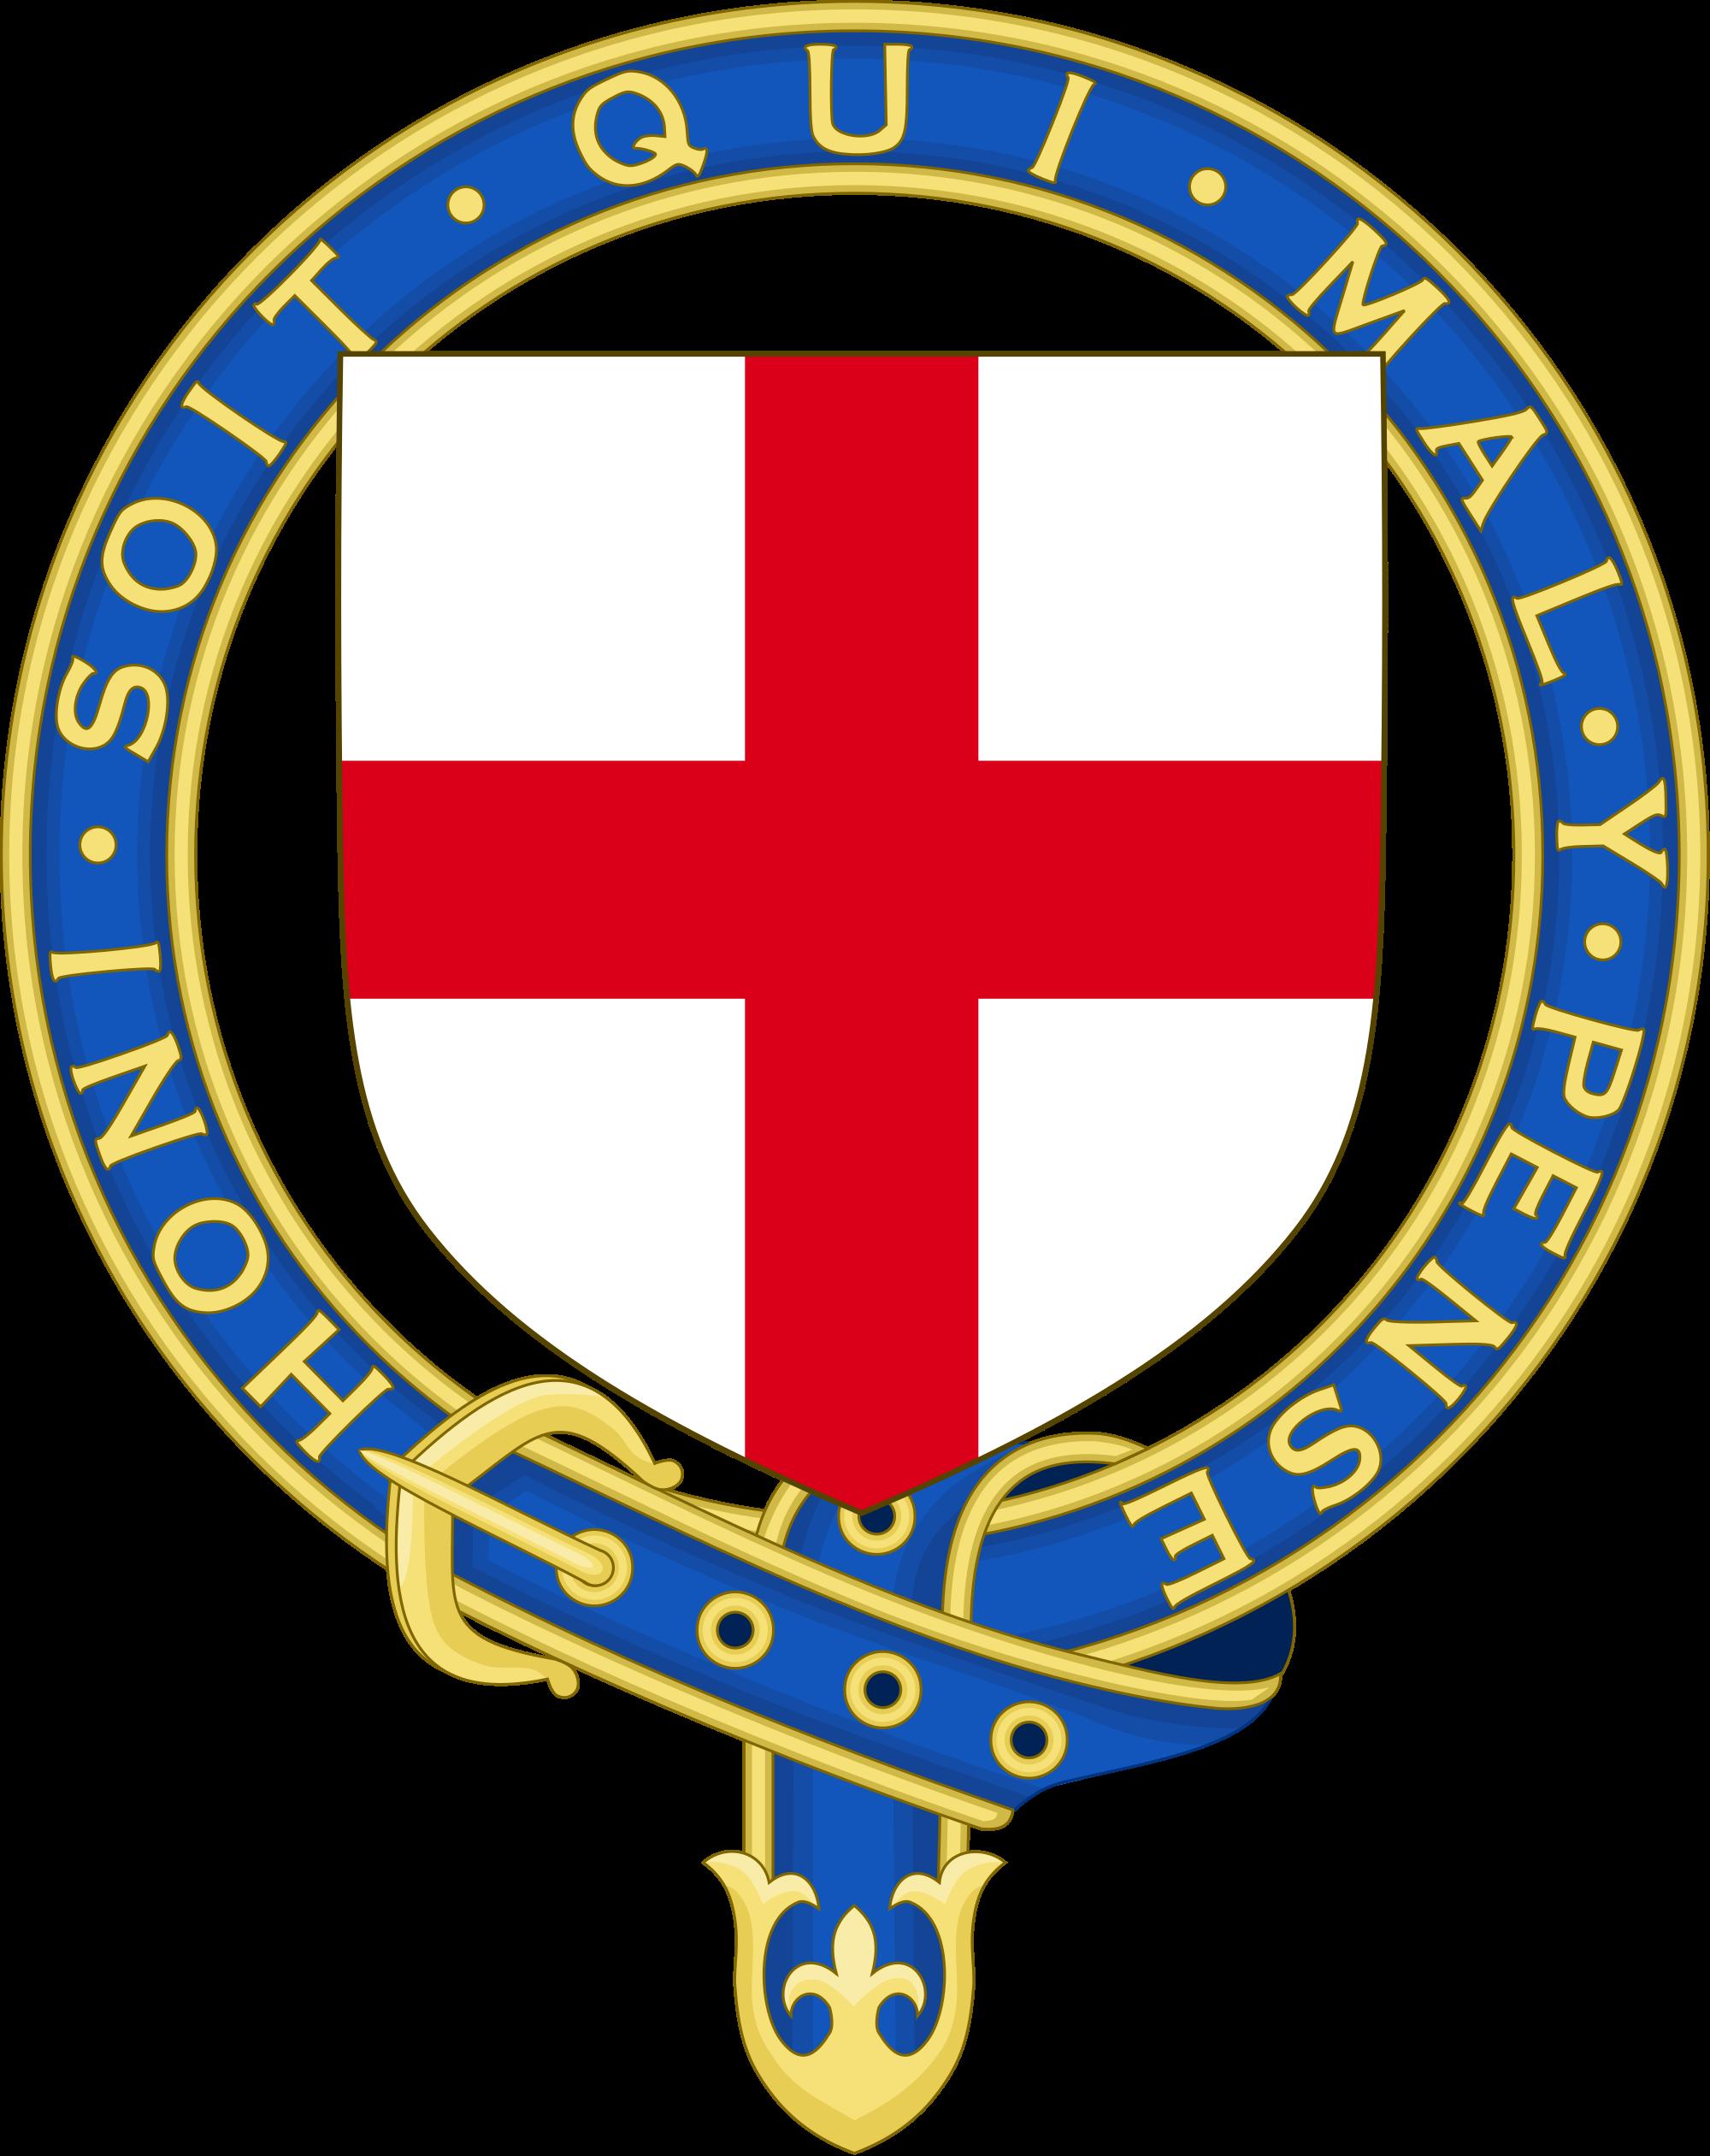 Order of the garter. Clipart shield ribbon